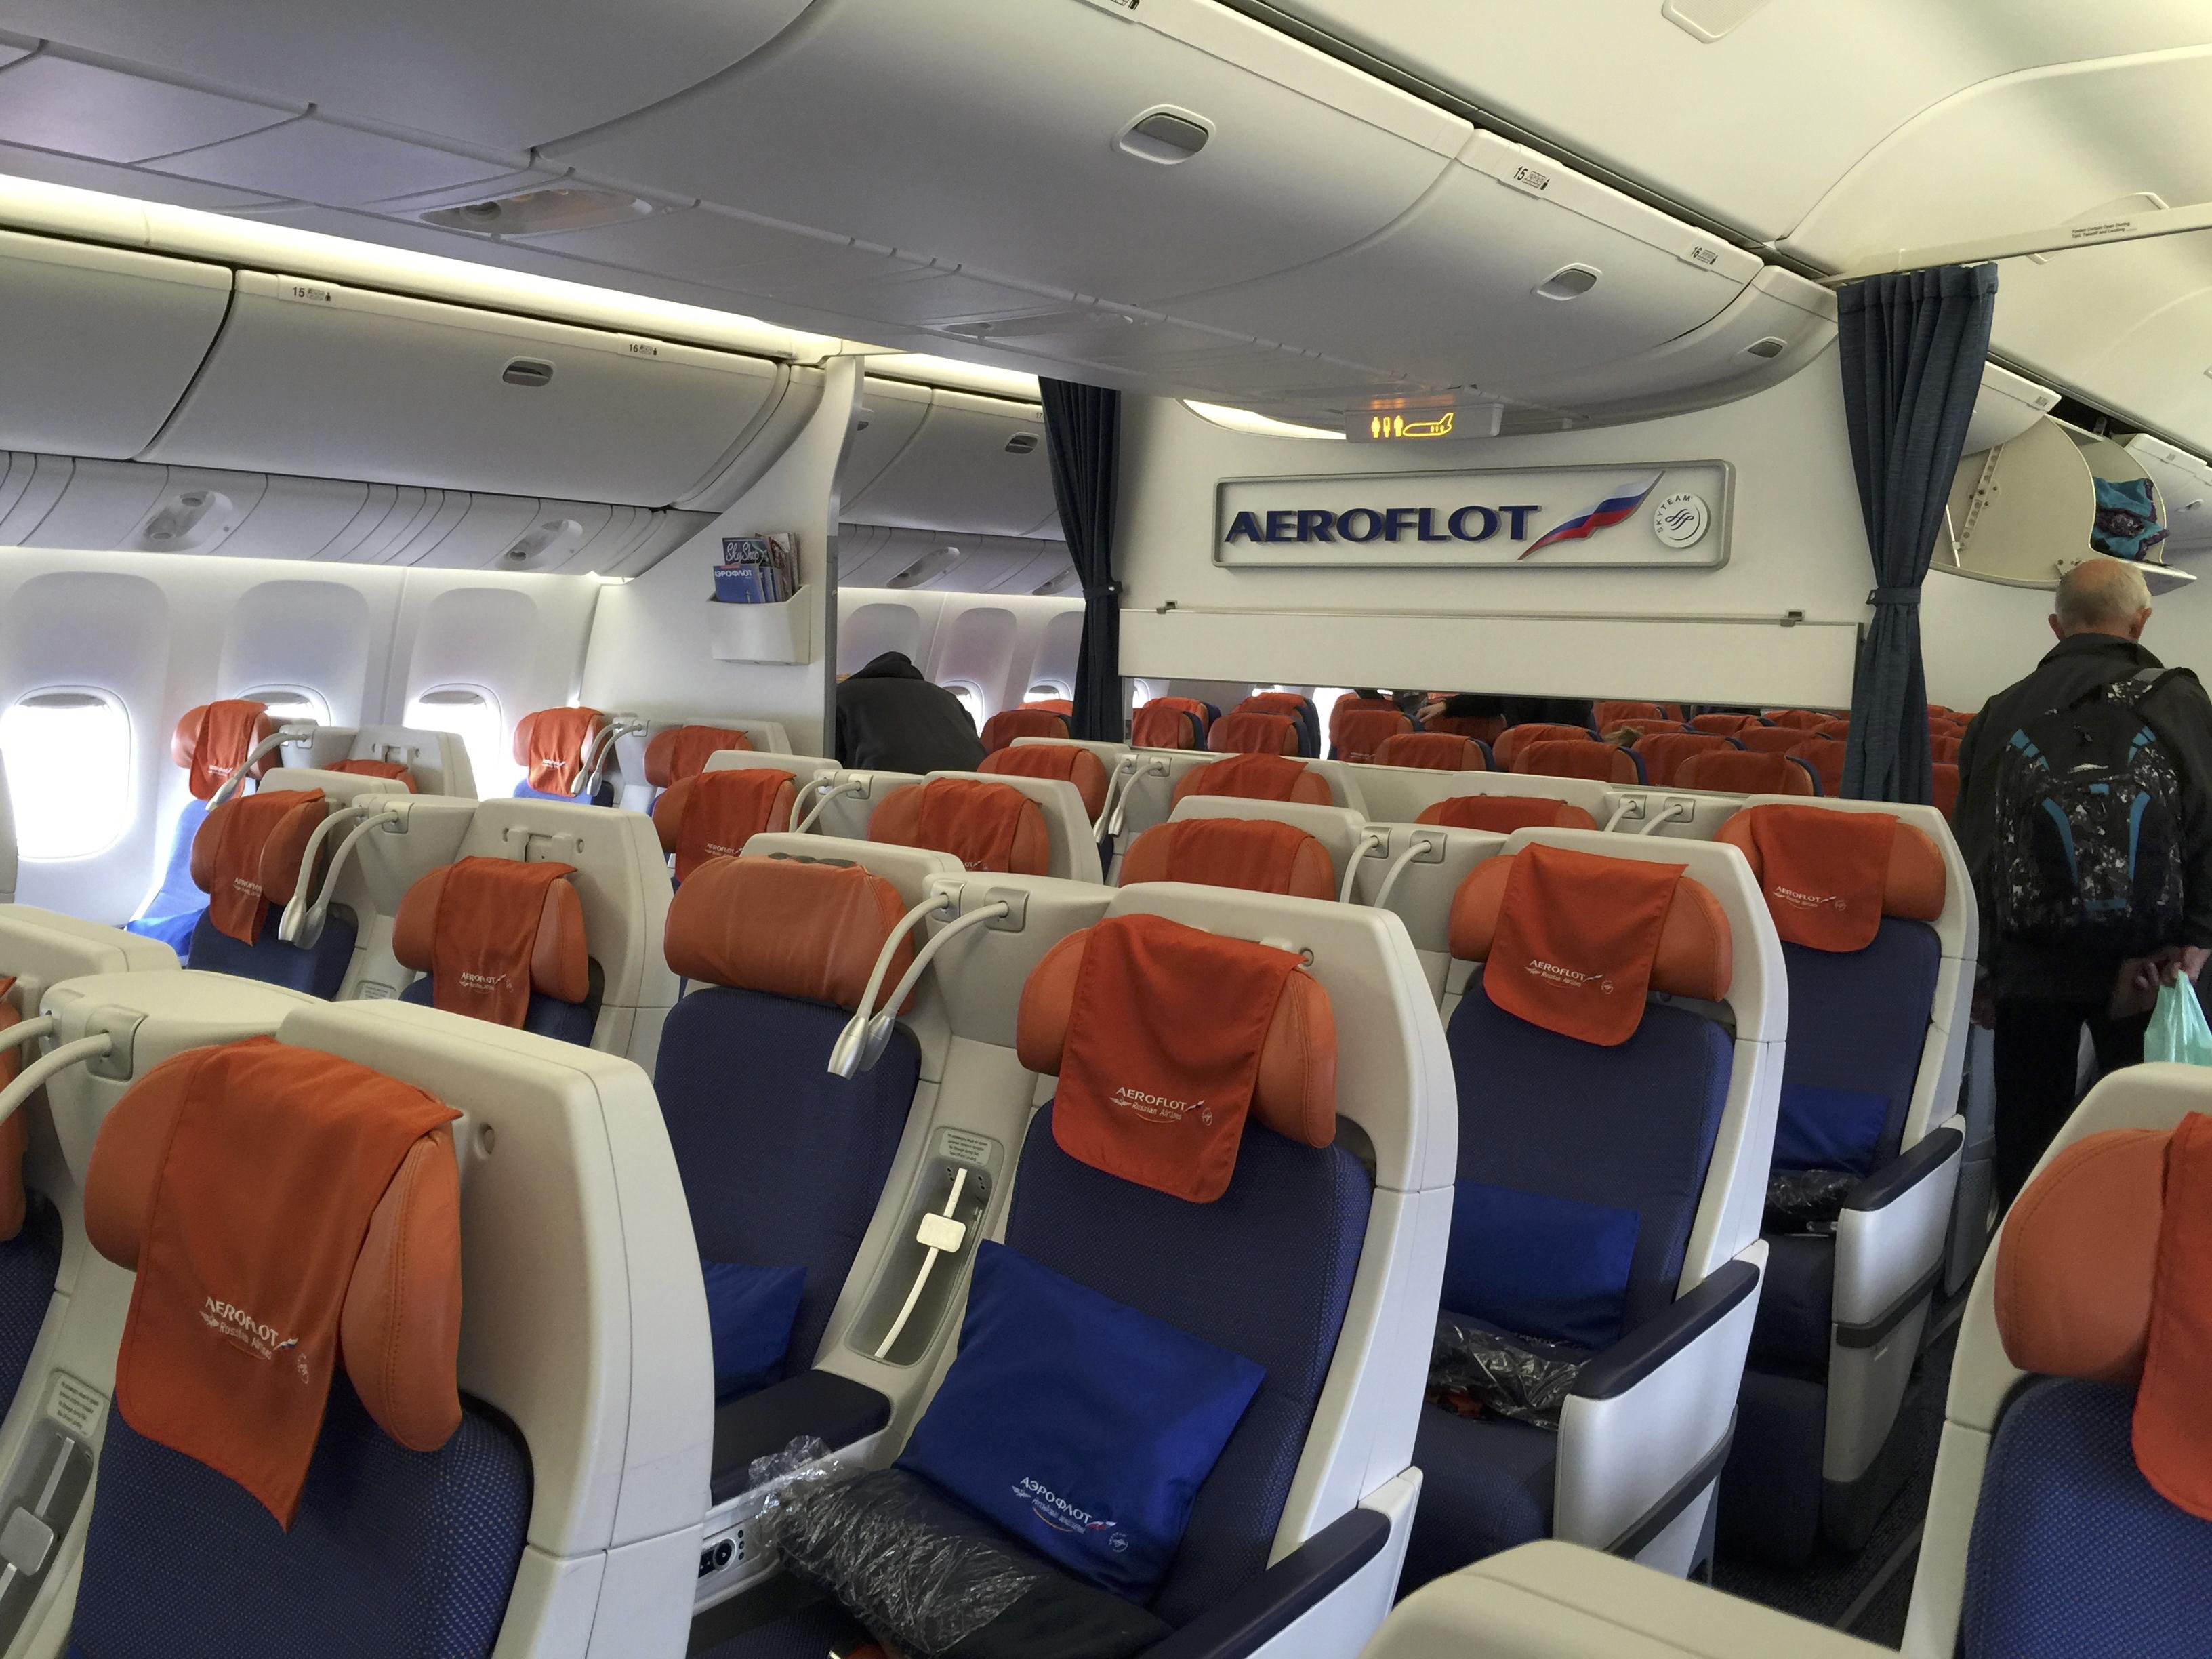 file aeroflot russian airlines plane interior may 2016 jpg